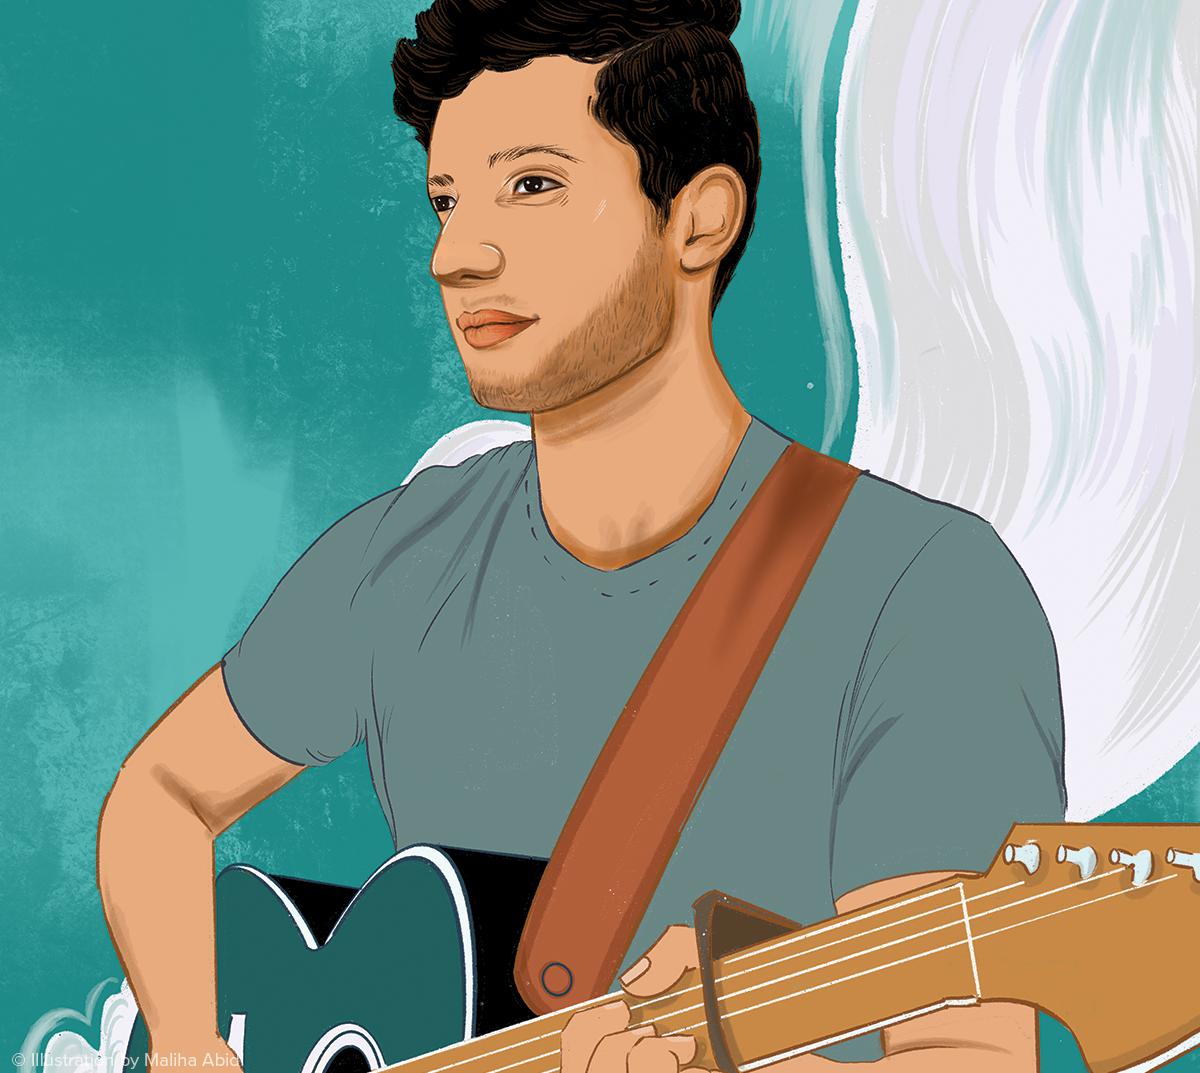 Abdallah illustrated